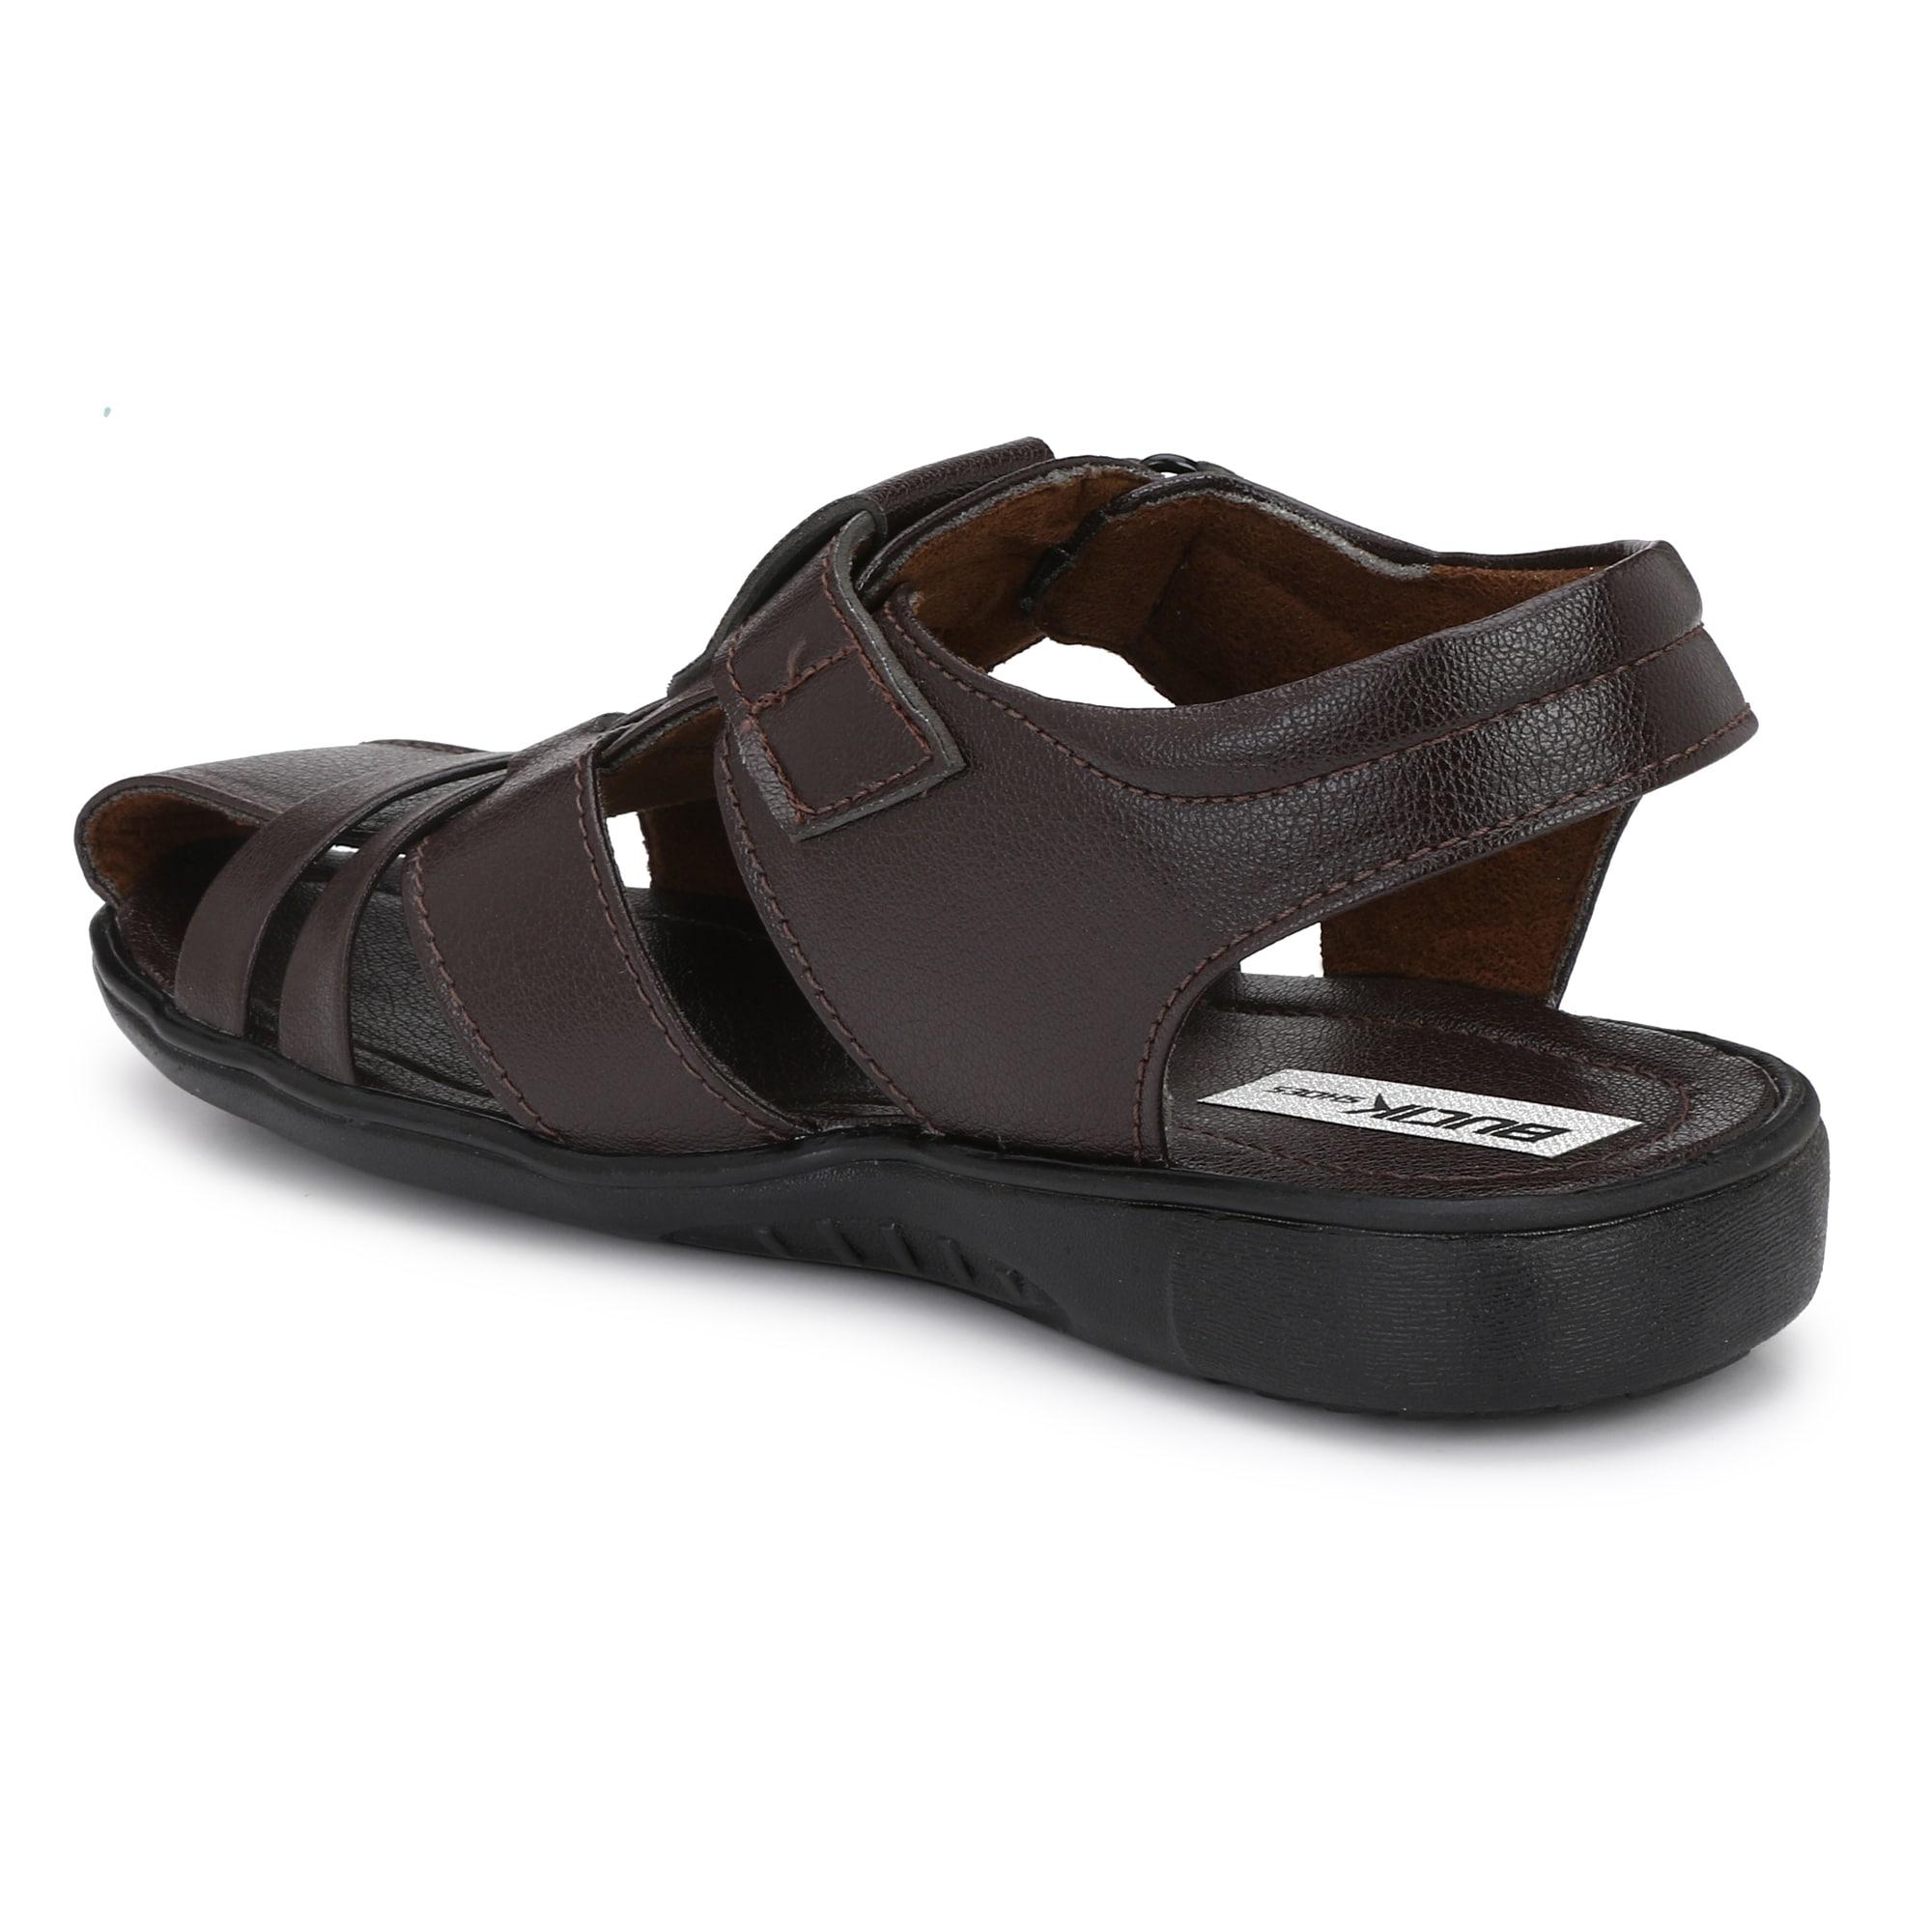 BUCIK Men's BROWN Synthetic Leather Casual Sandal BCK1021-BROWN (Brown,6-10,8 PAIR)